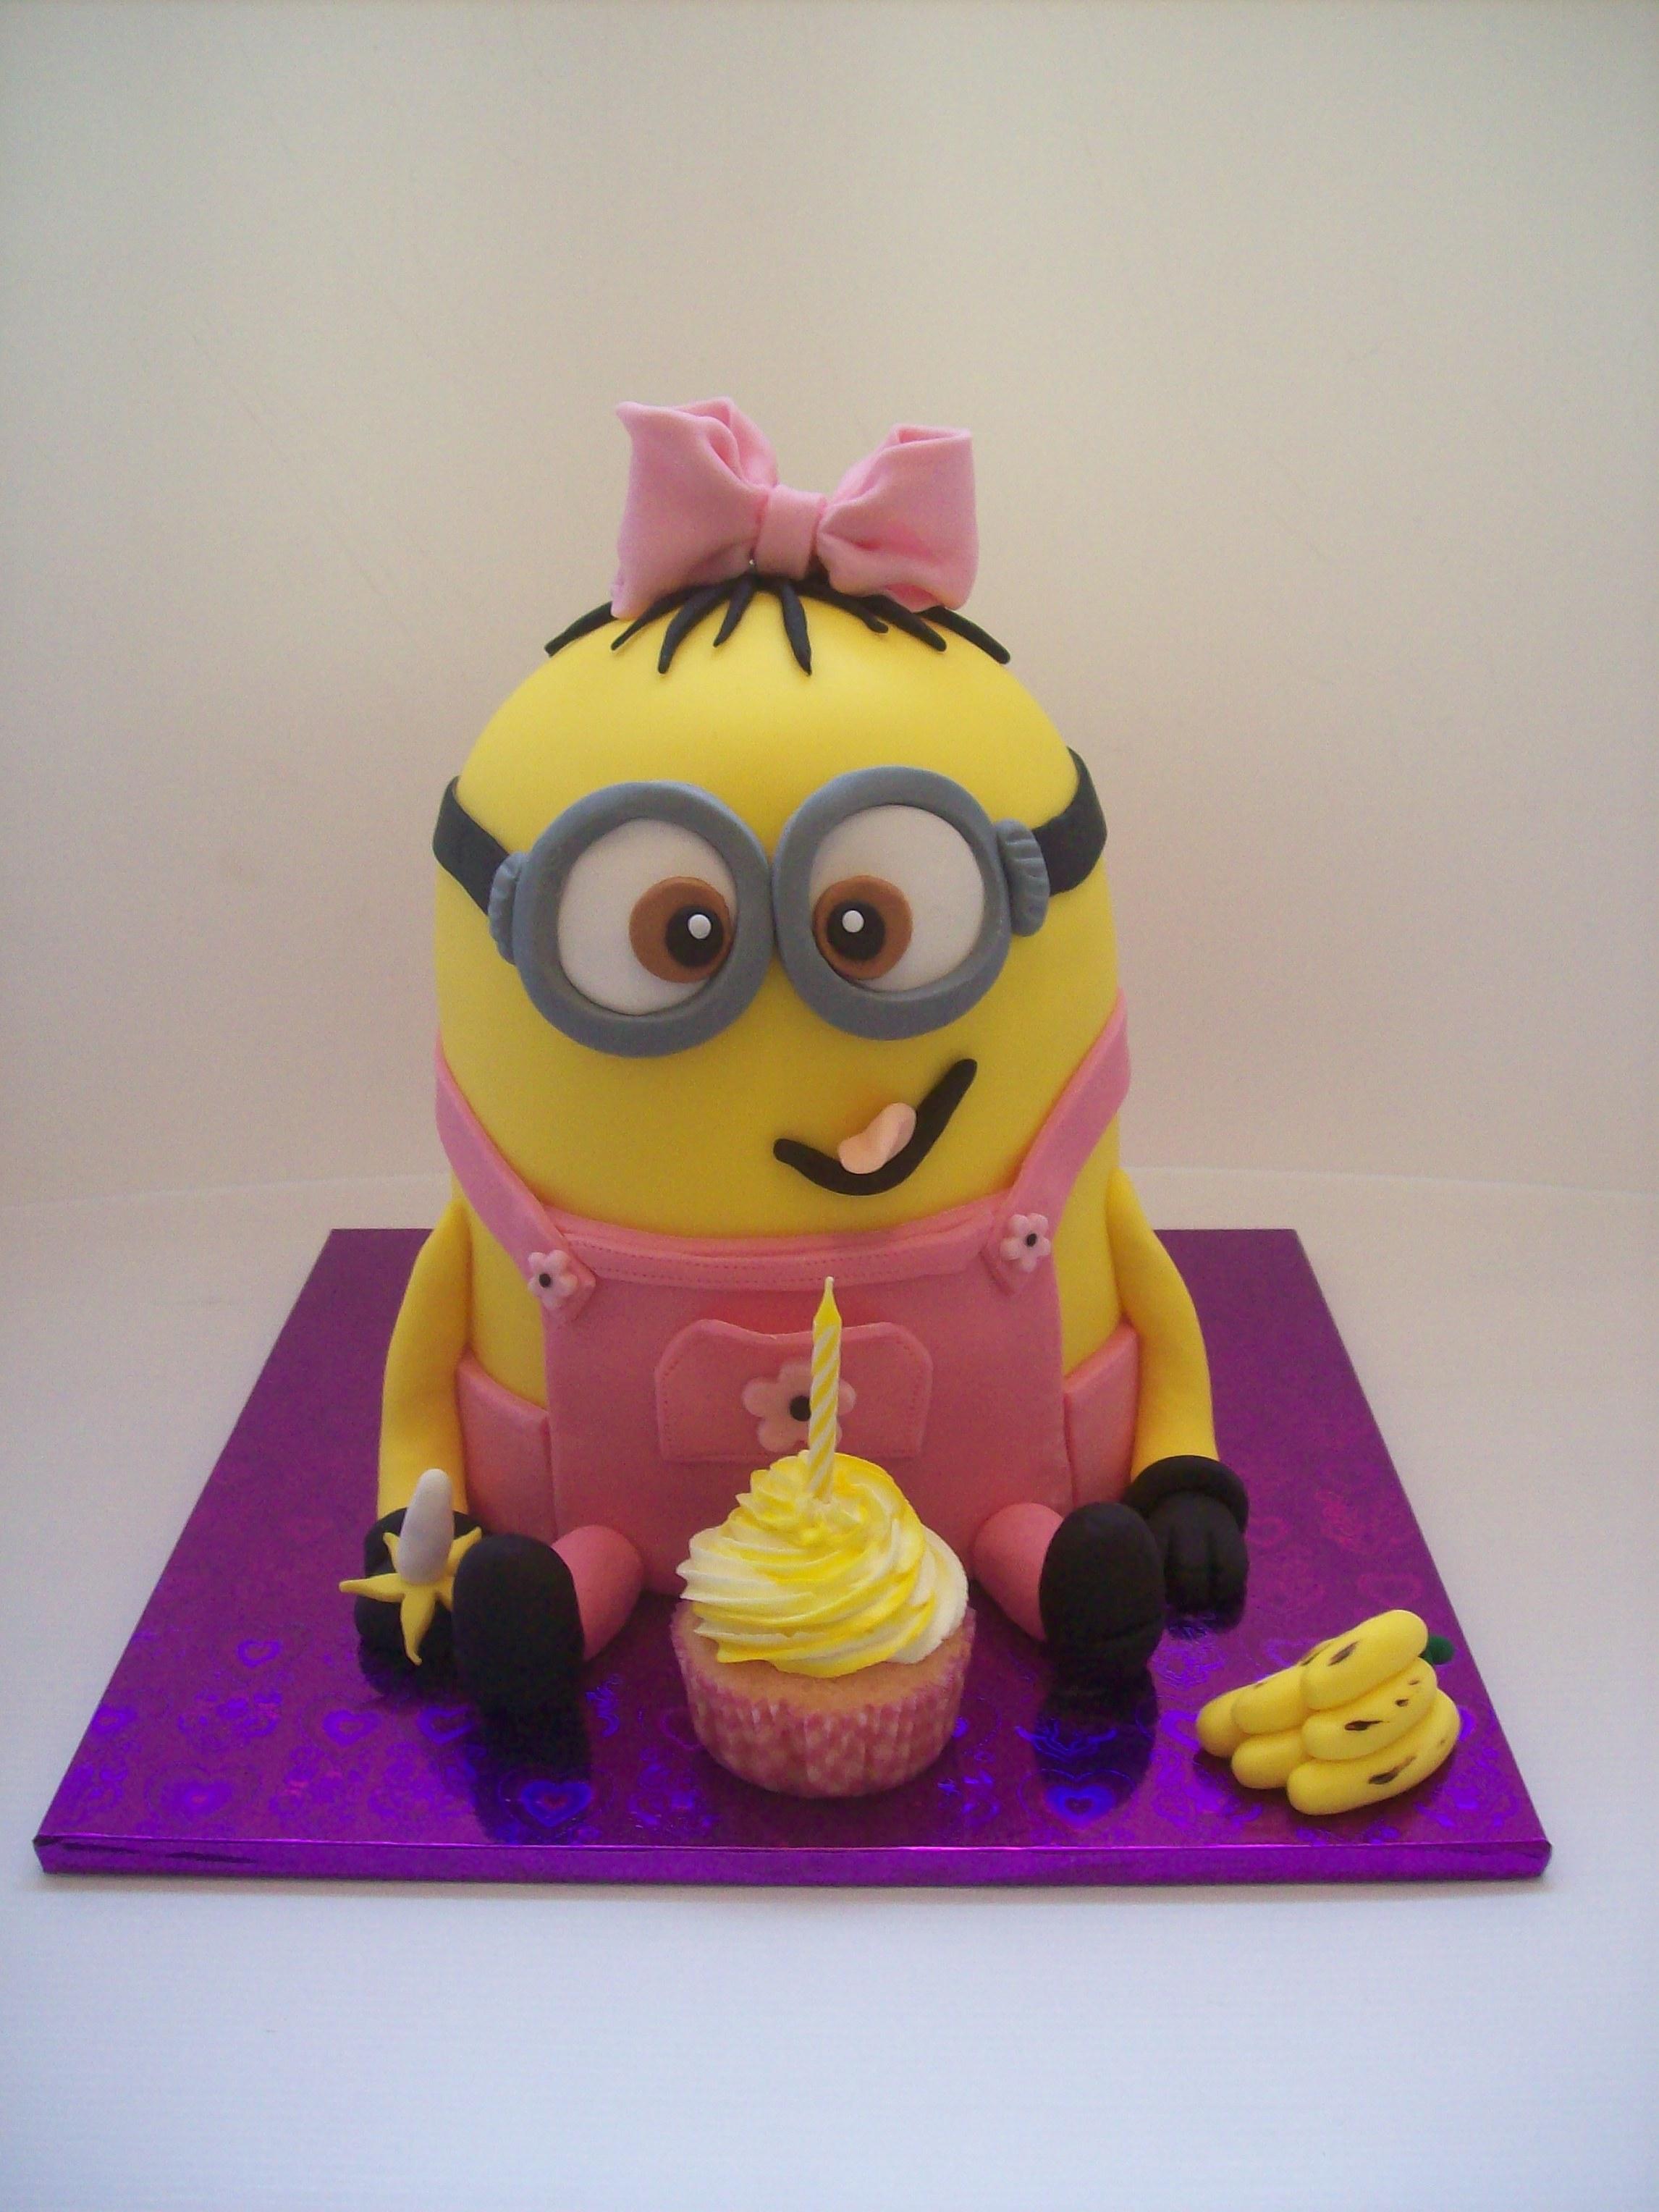 Girl Minion Cake 295 Temptation Cakes Temptation Cakes